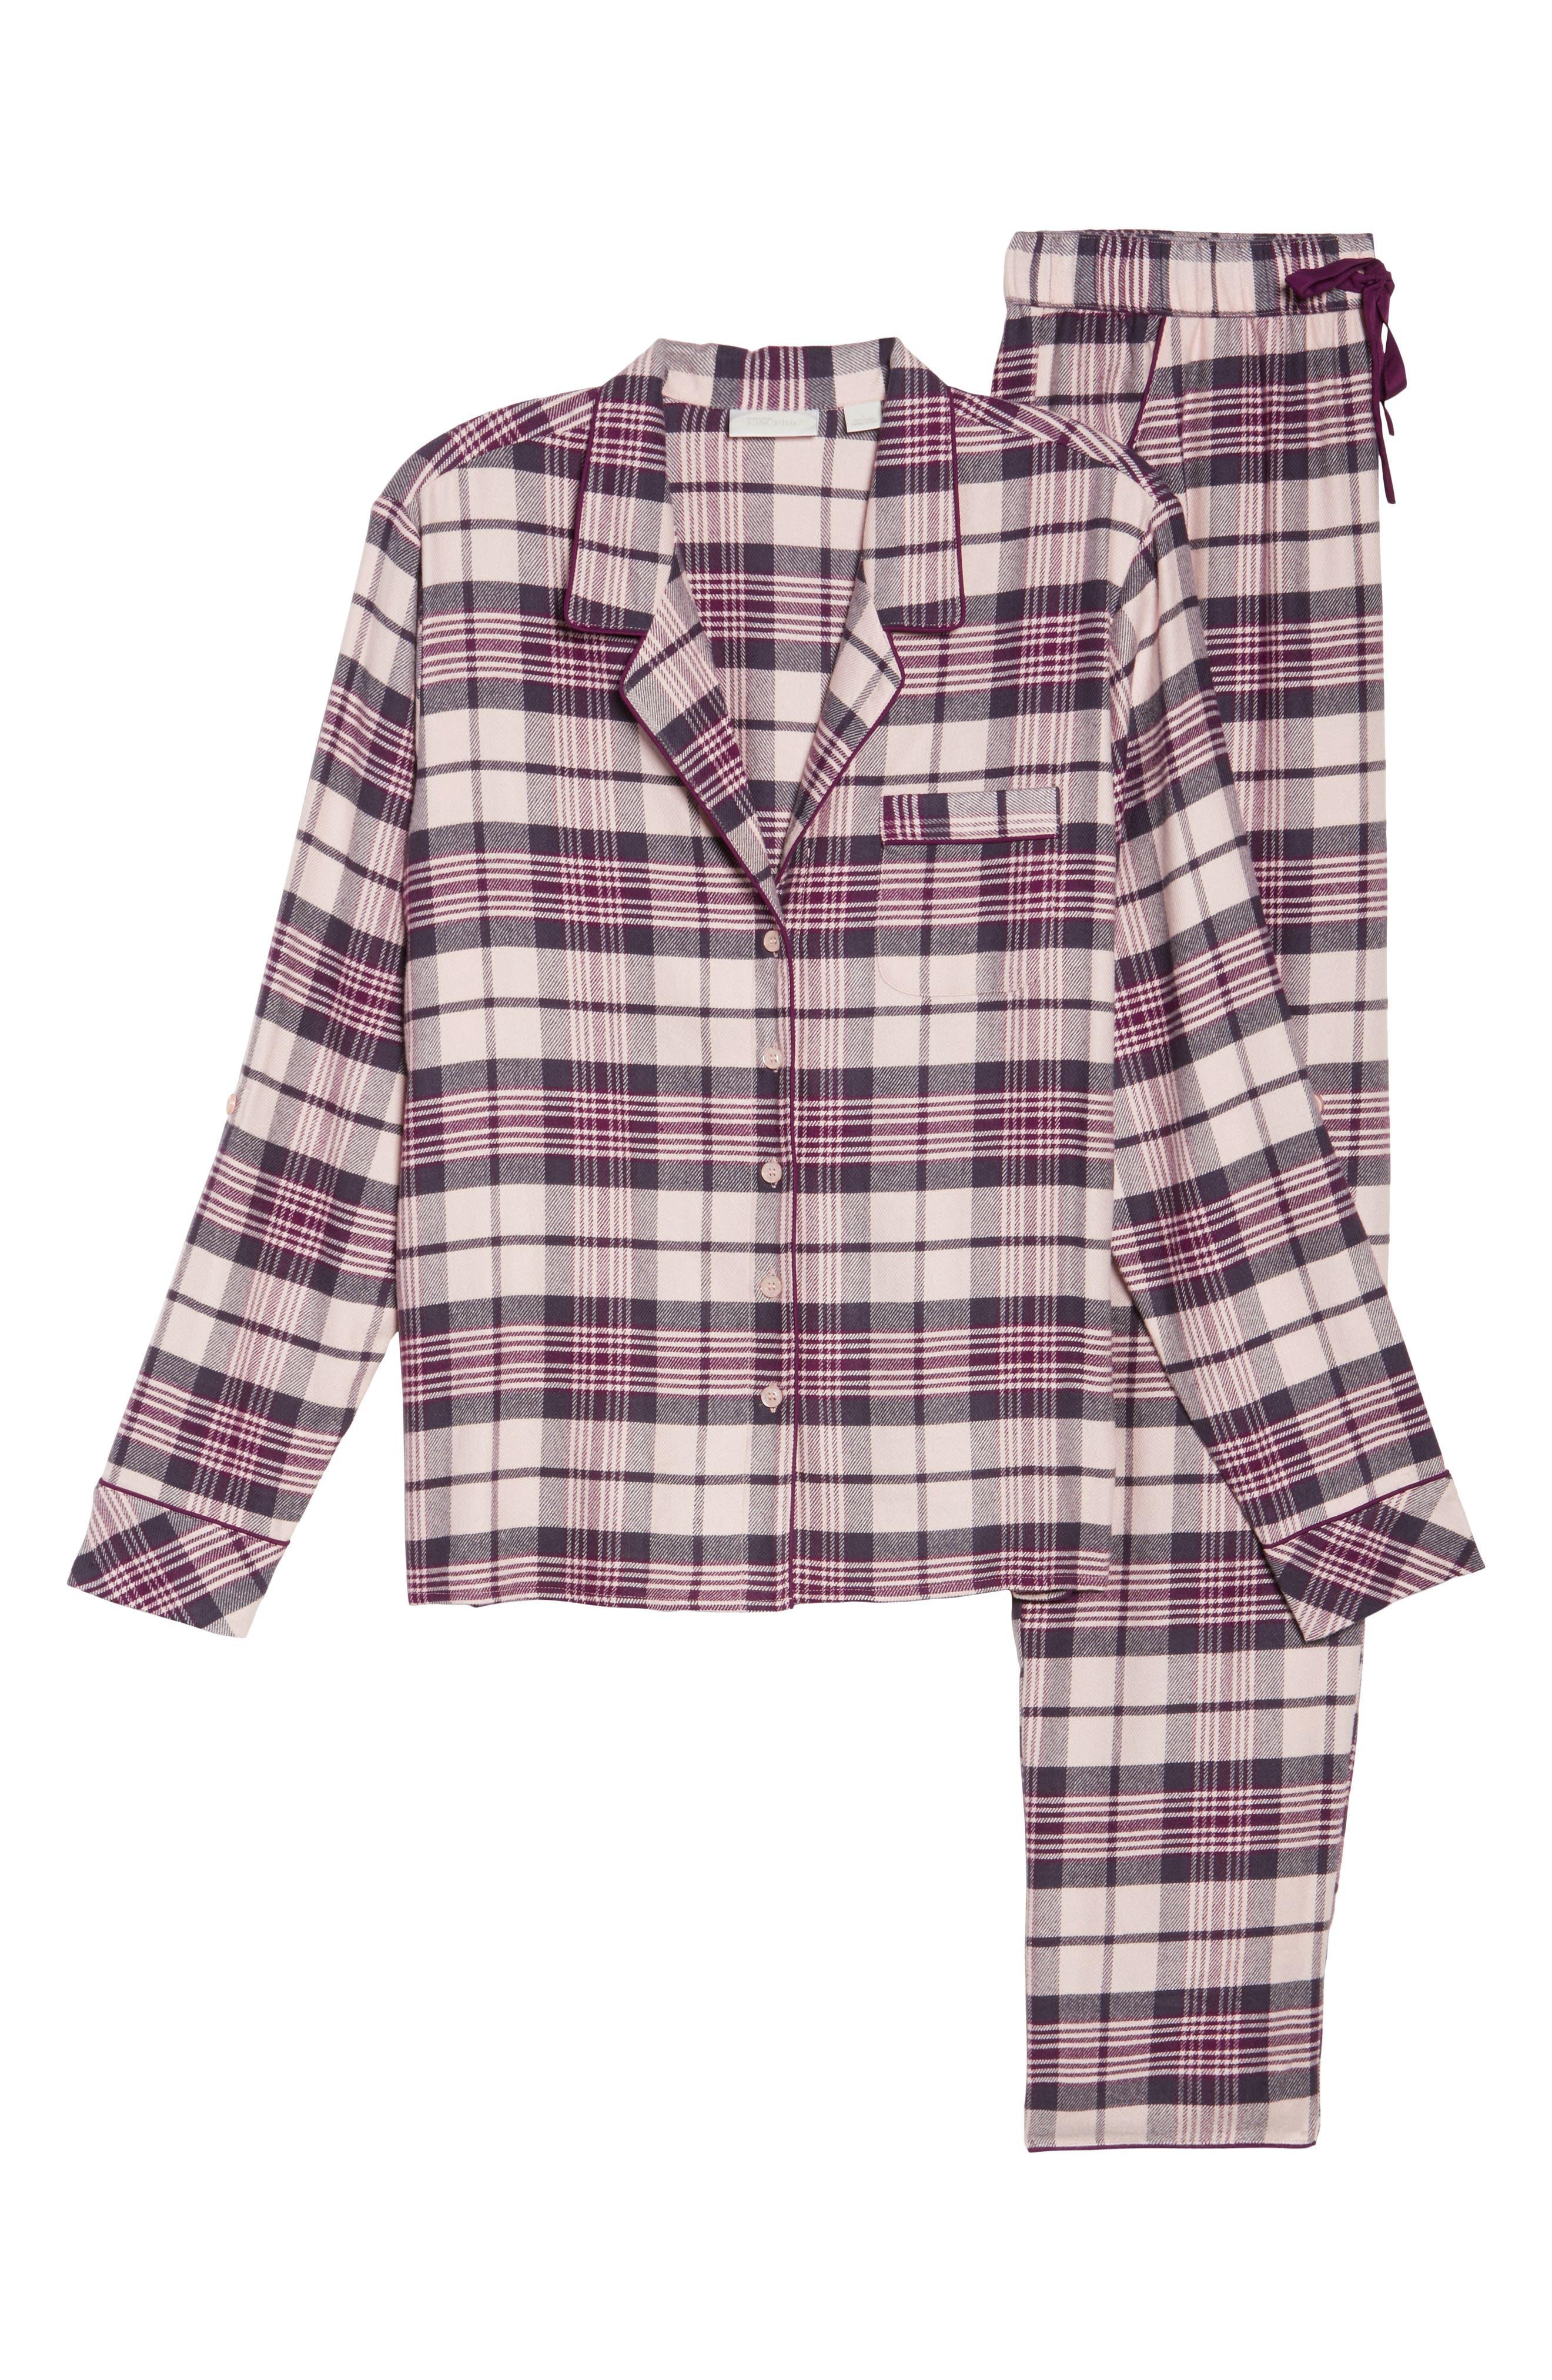 Lingerie Starlight Flannel Pajamas,                             Alternate thumbnail 30, color,